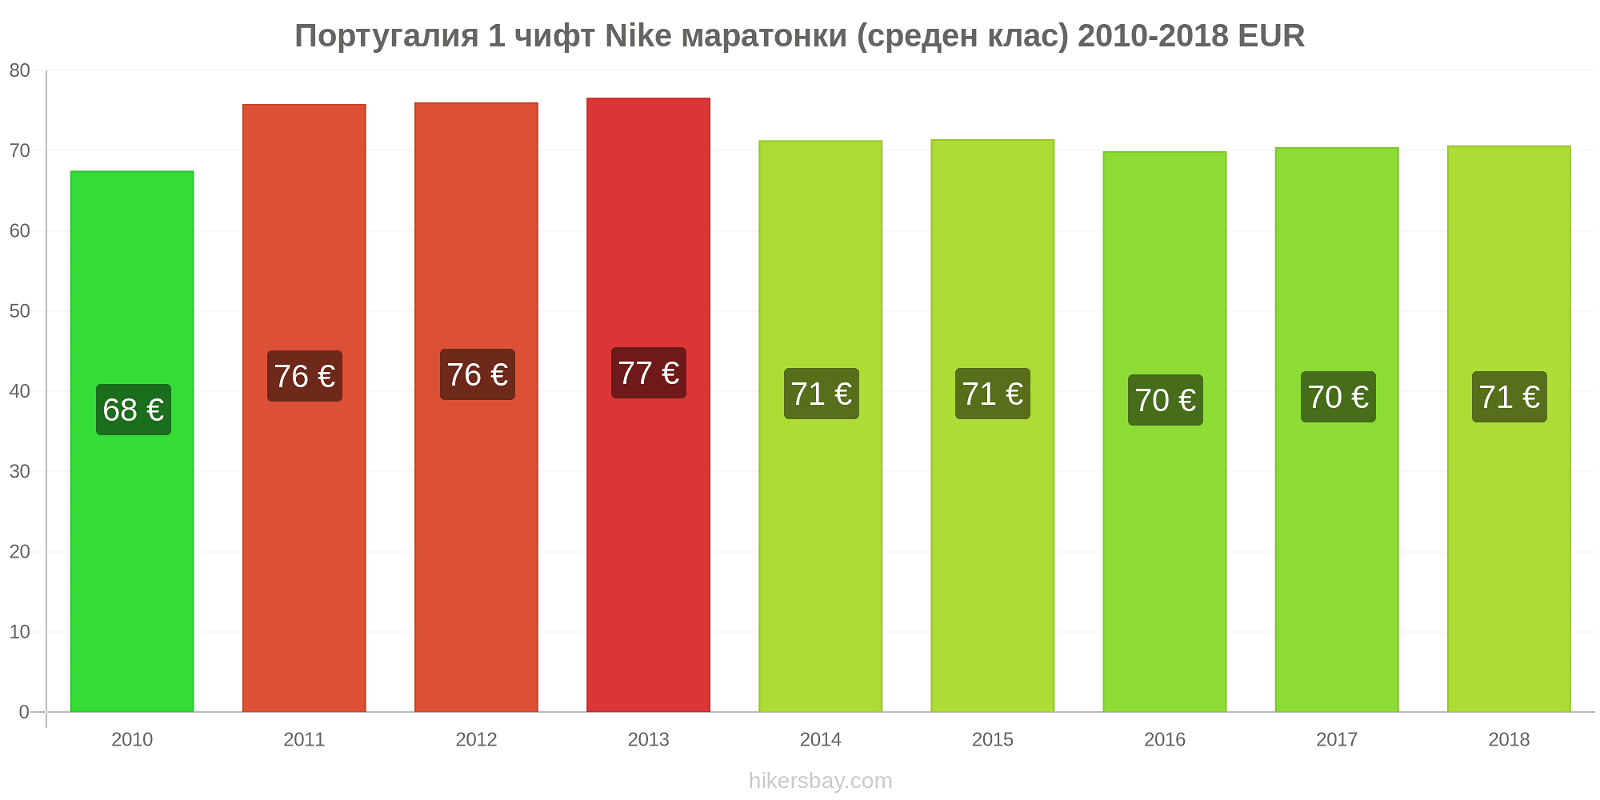 Португалия ценови промени 1 чифт Nike маратонки (среден клас) hikersbay.com